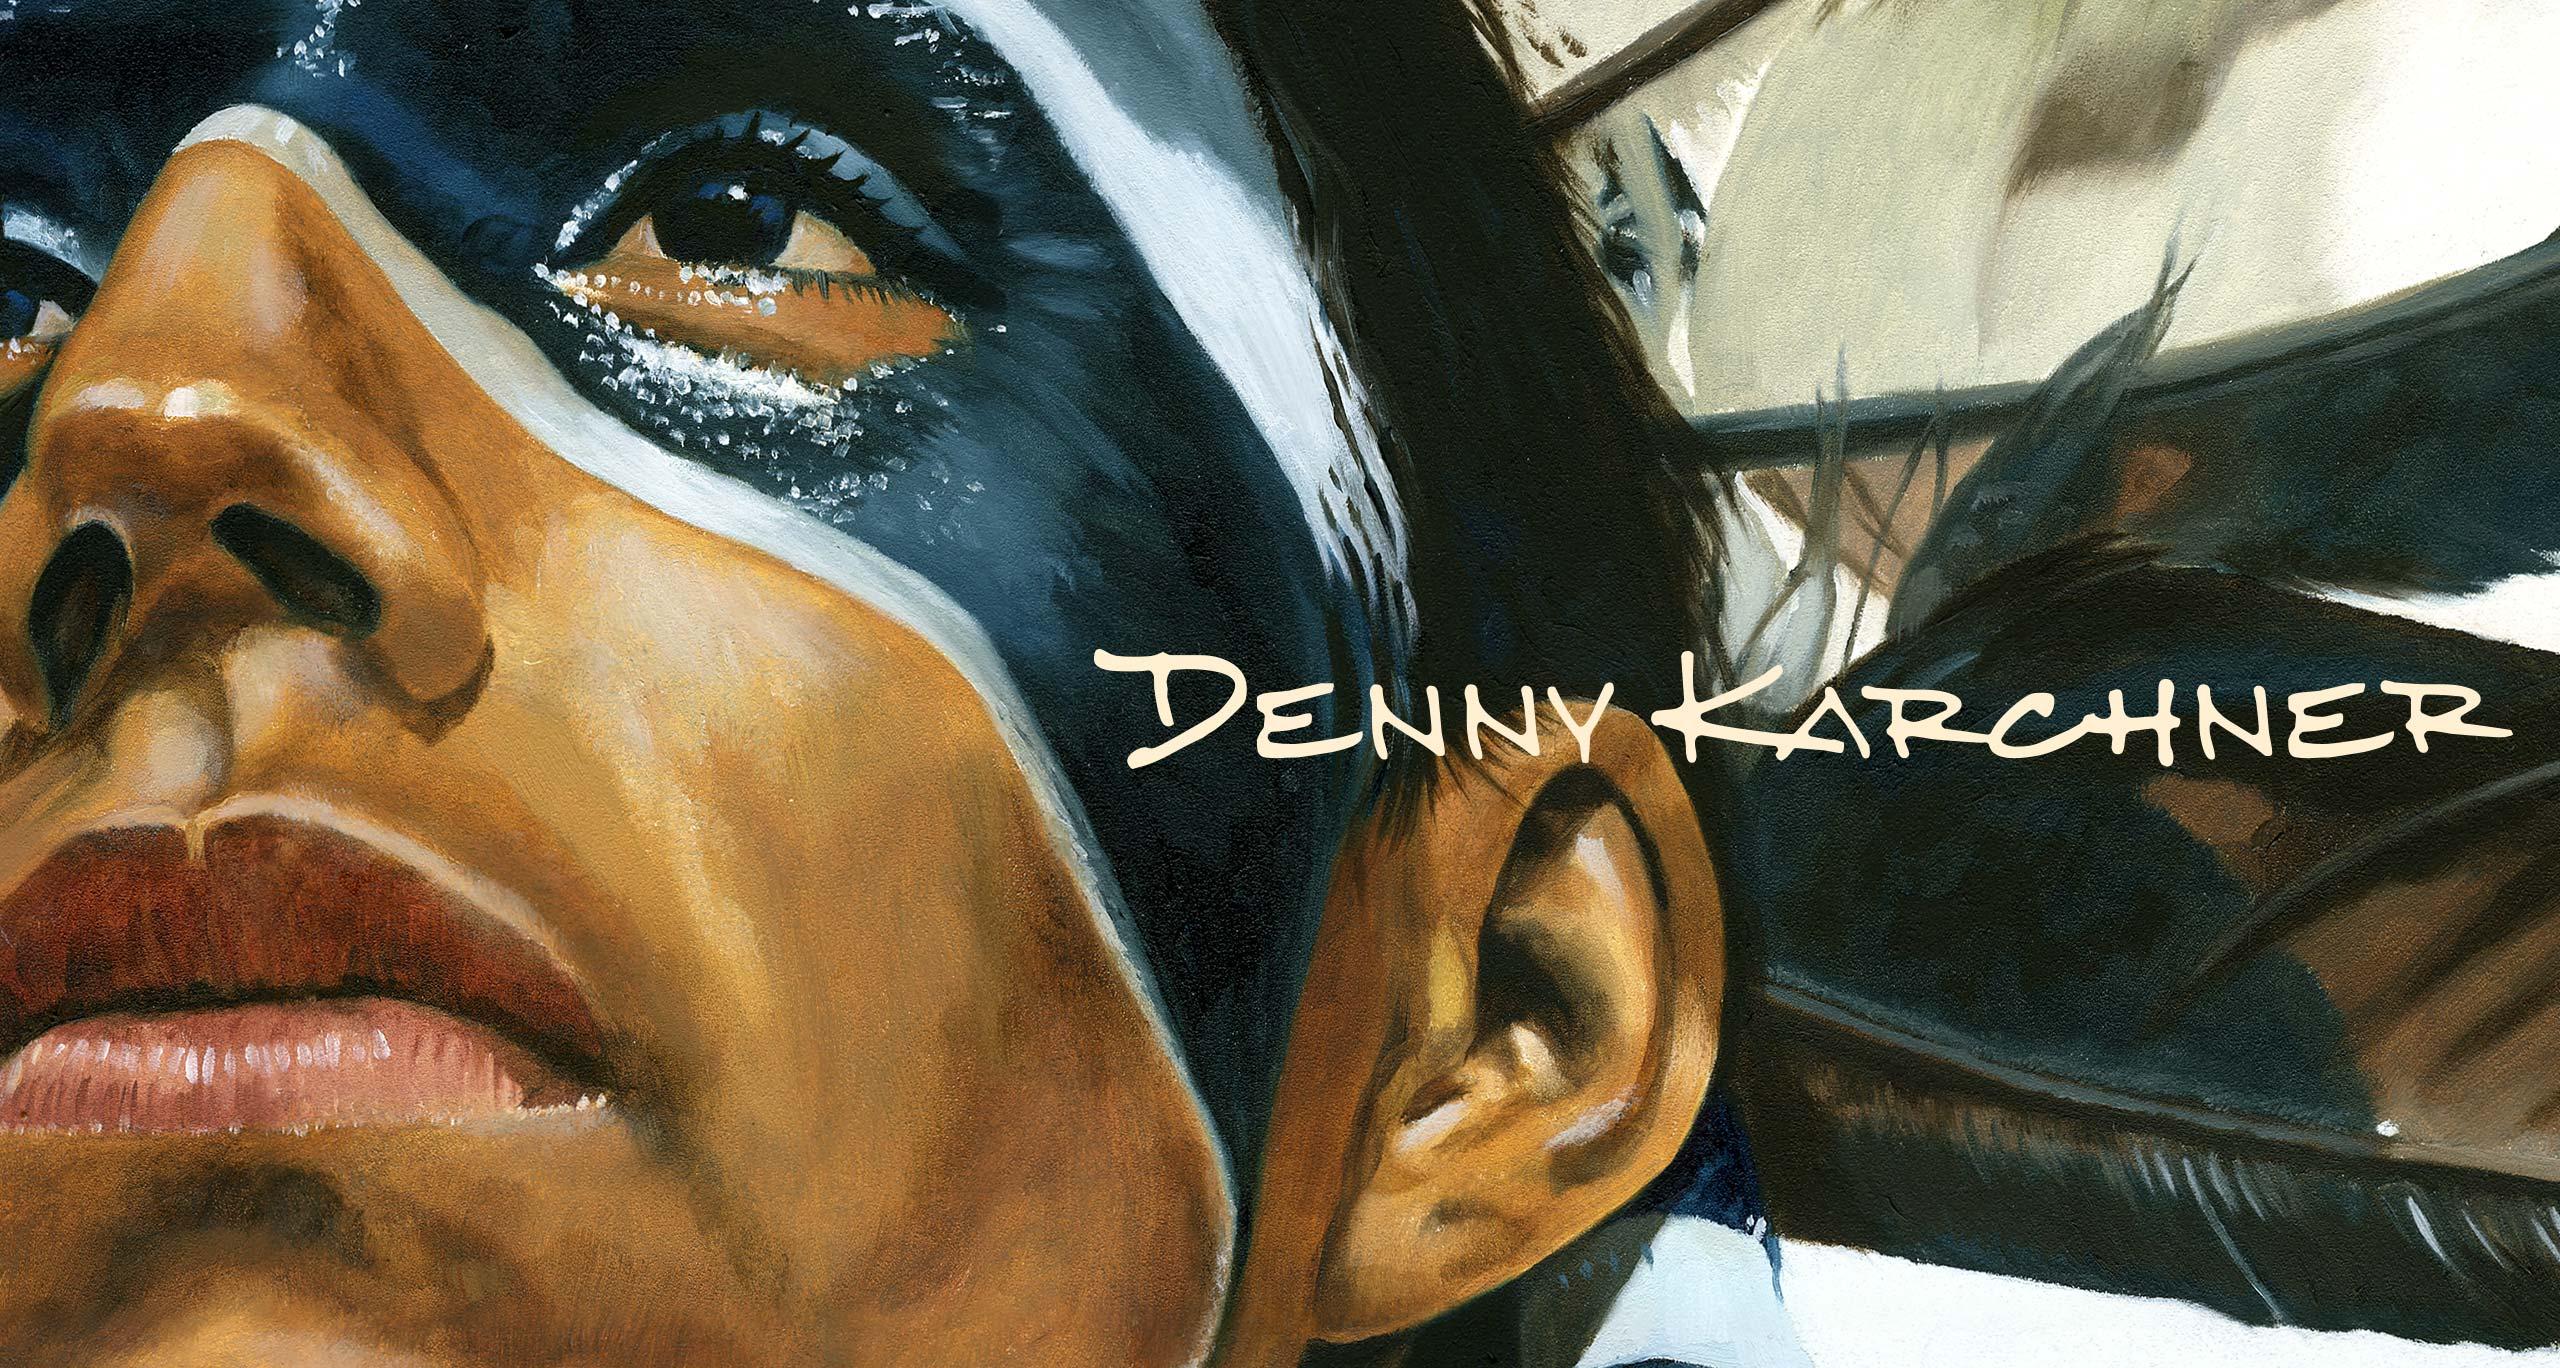 denny karchner western art